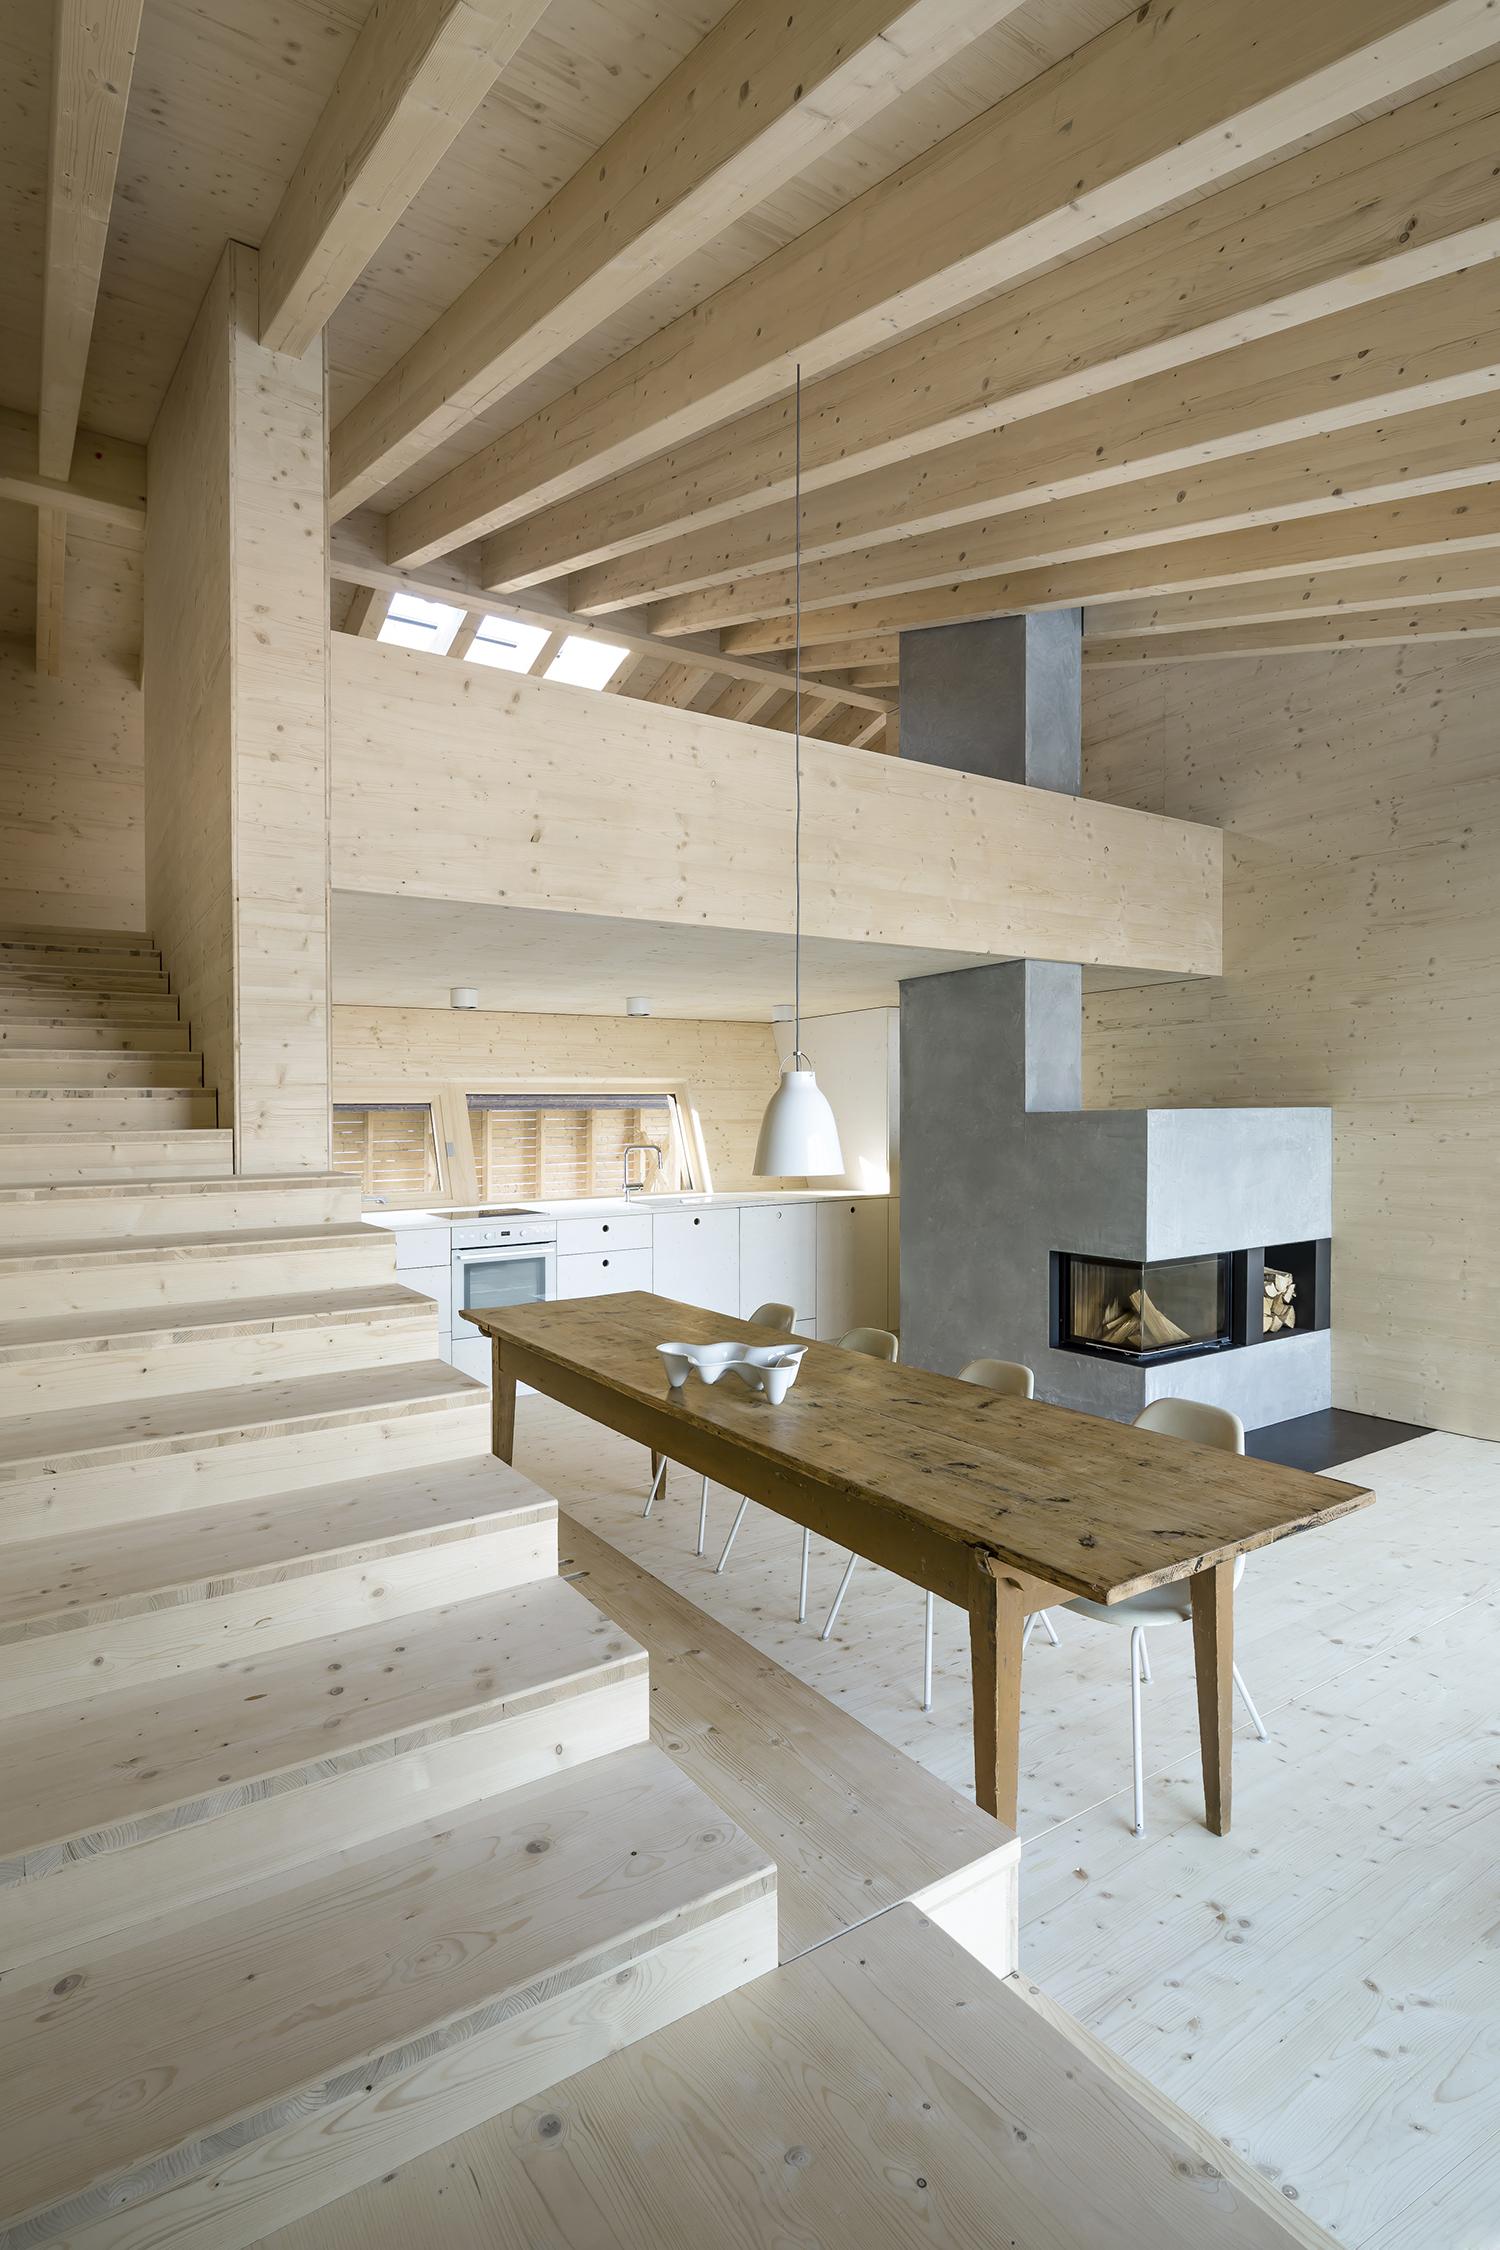 gallery of house p yonder architektur und design 3. Black Bedroom Furniture Sets. Home Design Ideas